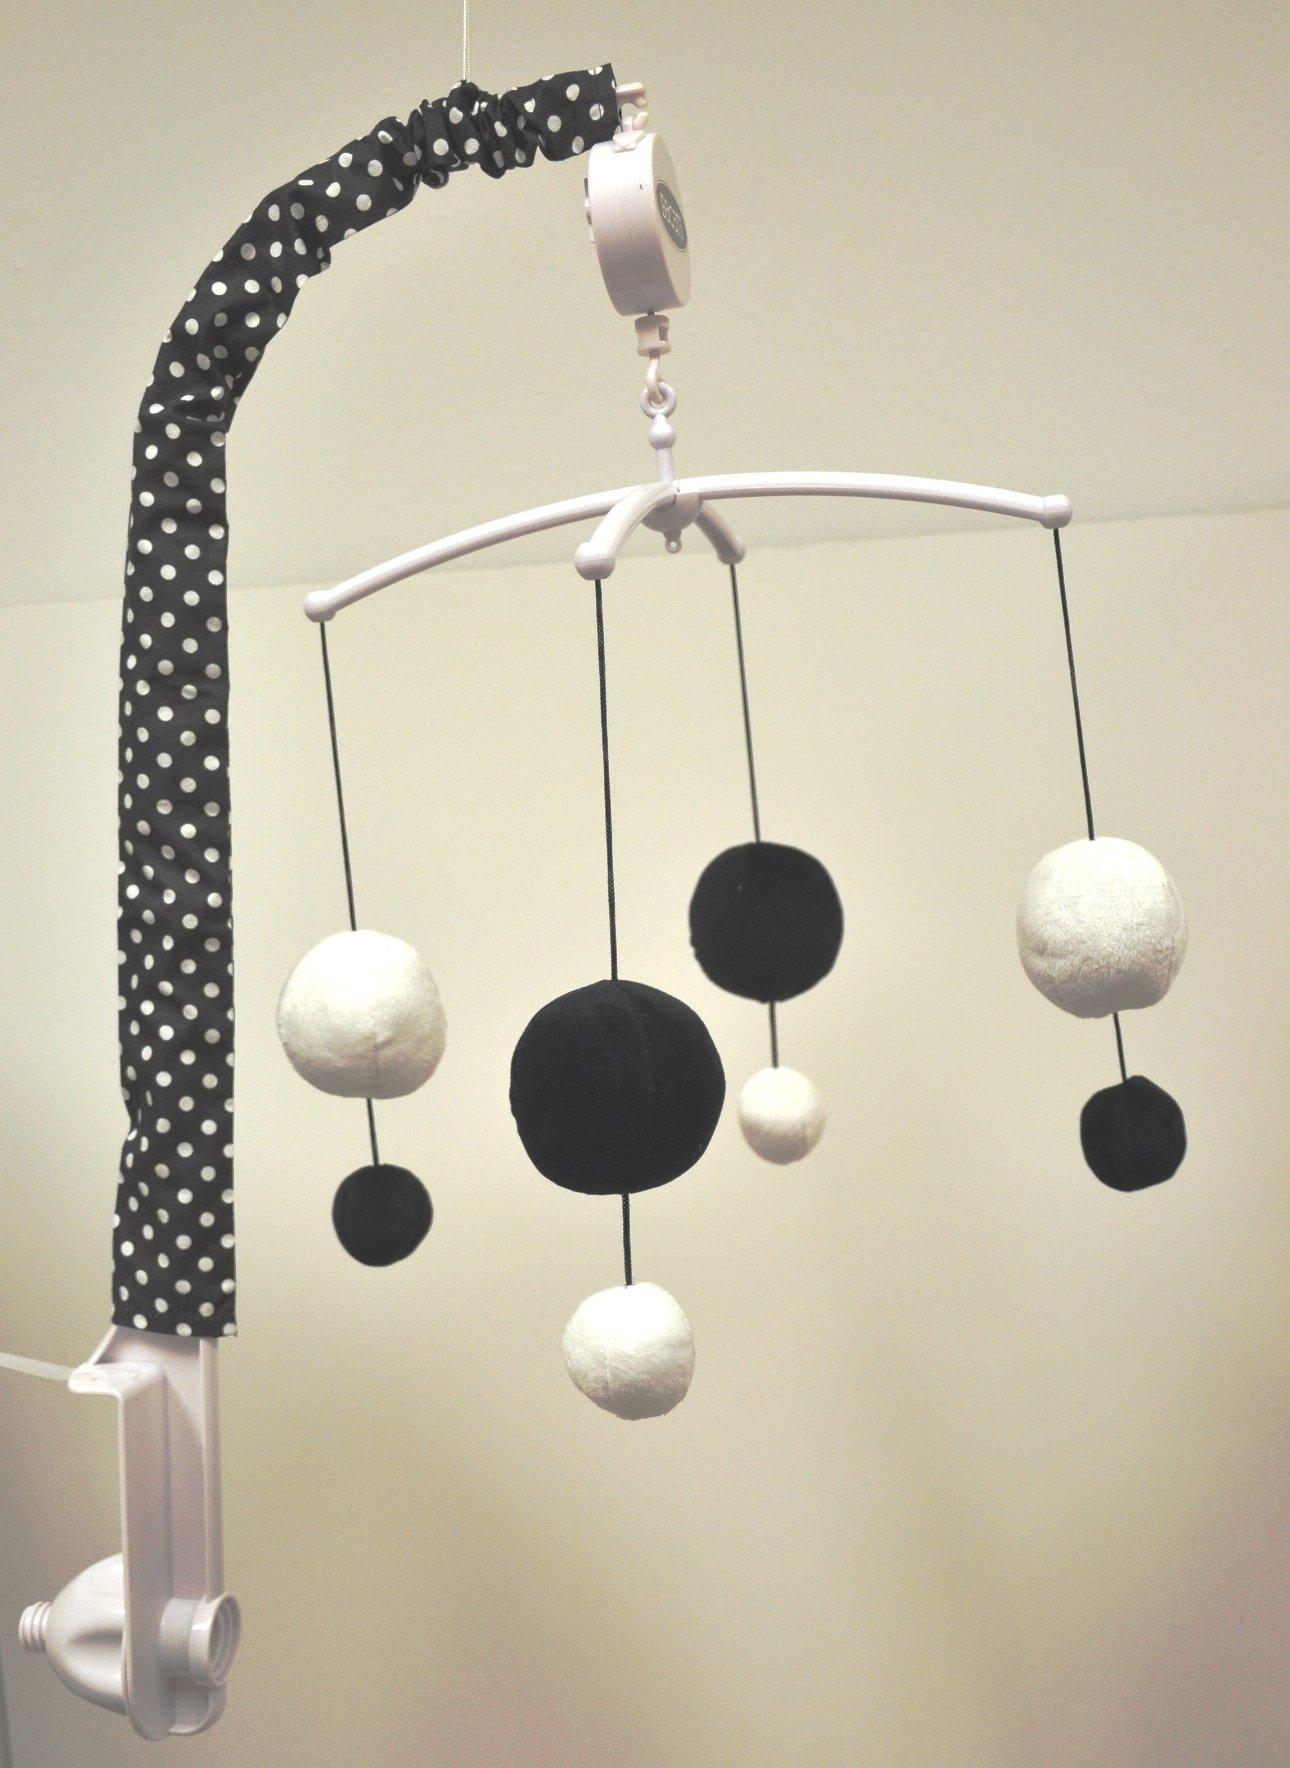 Bacati - Dots/pin Stripes Black/white Musical Mobile